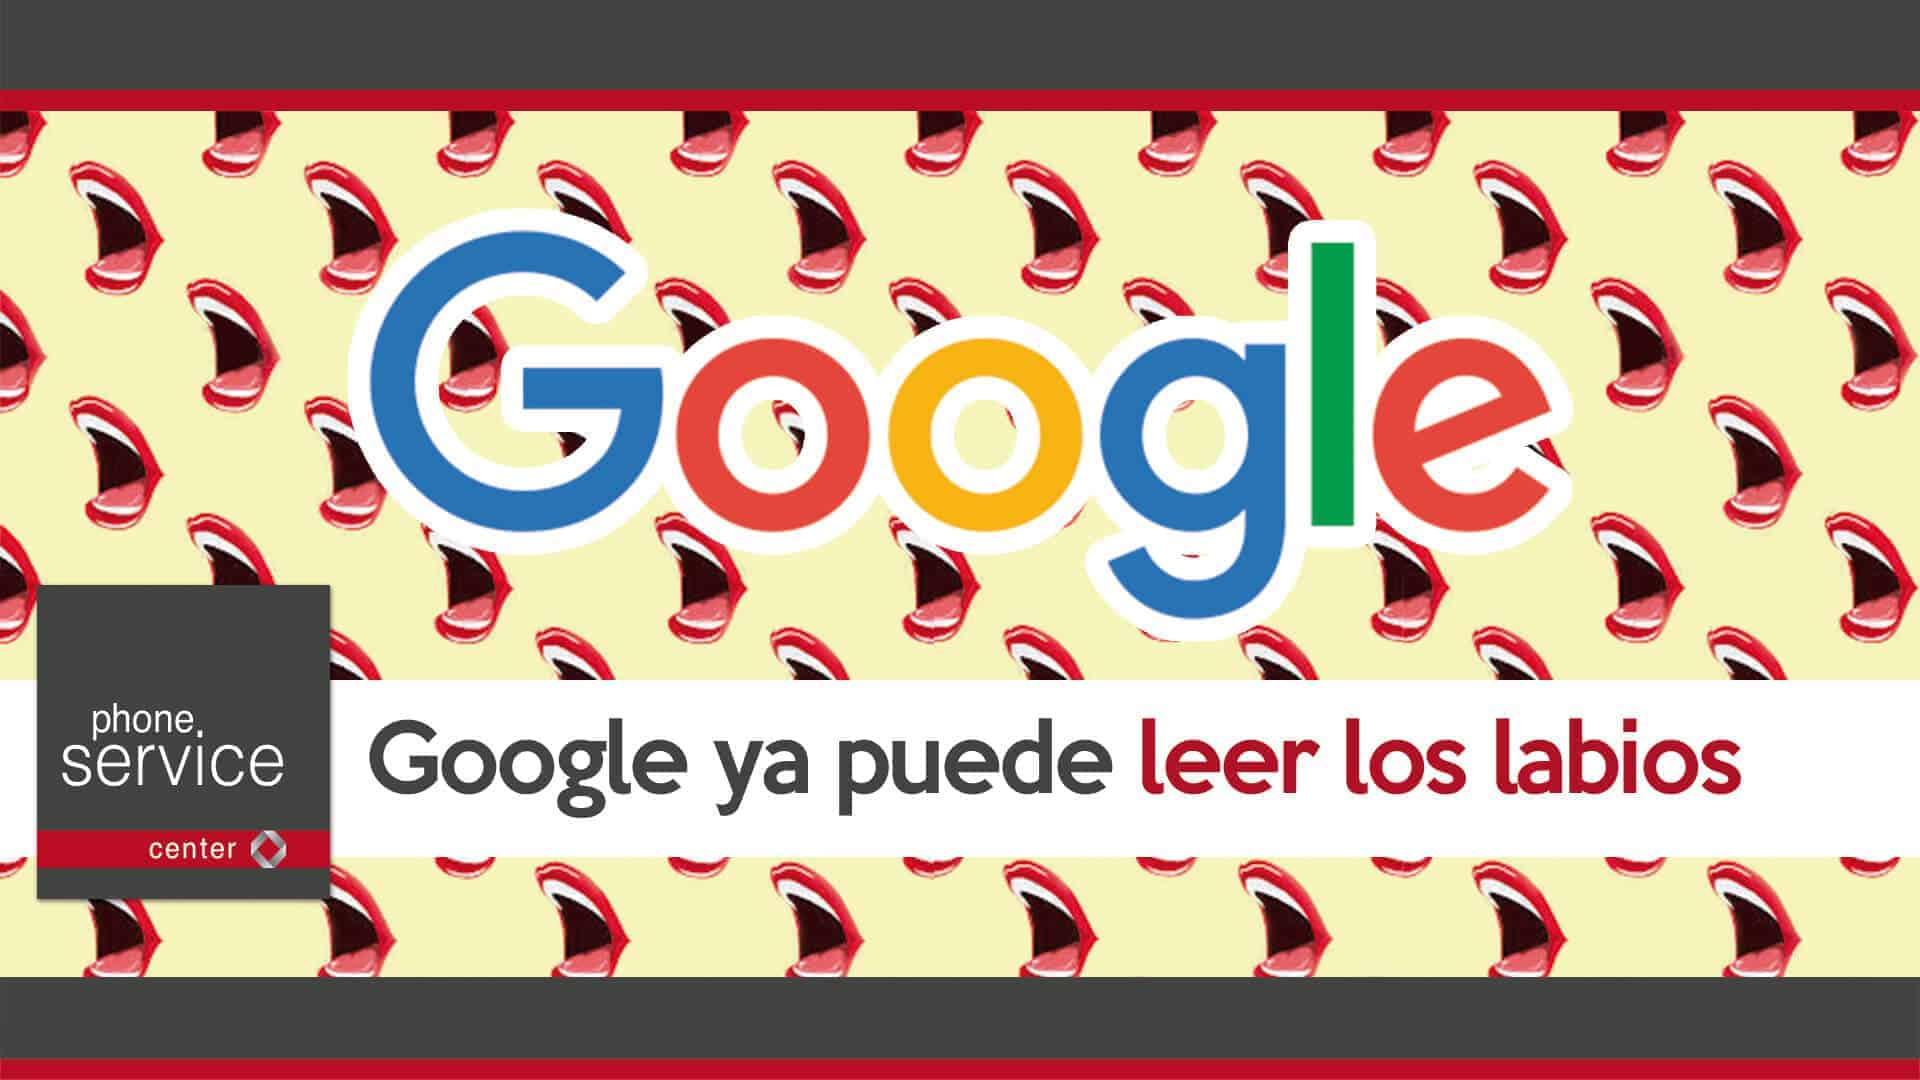 Google ya puede leer los labios